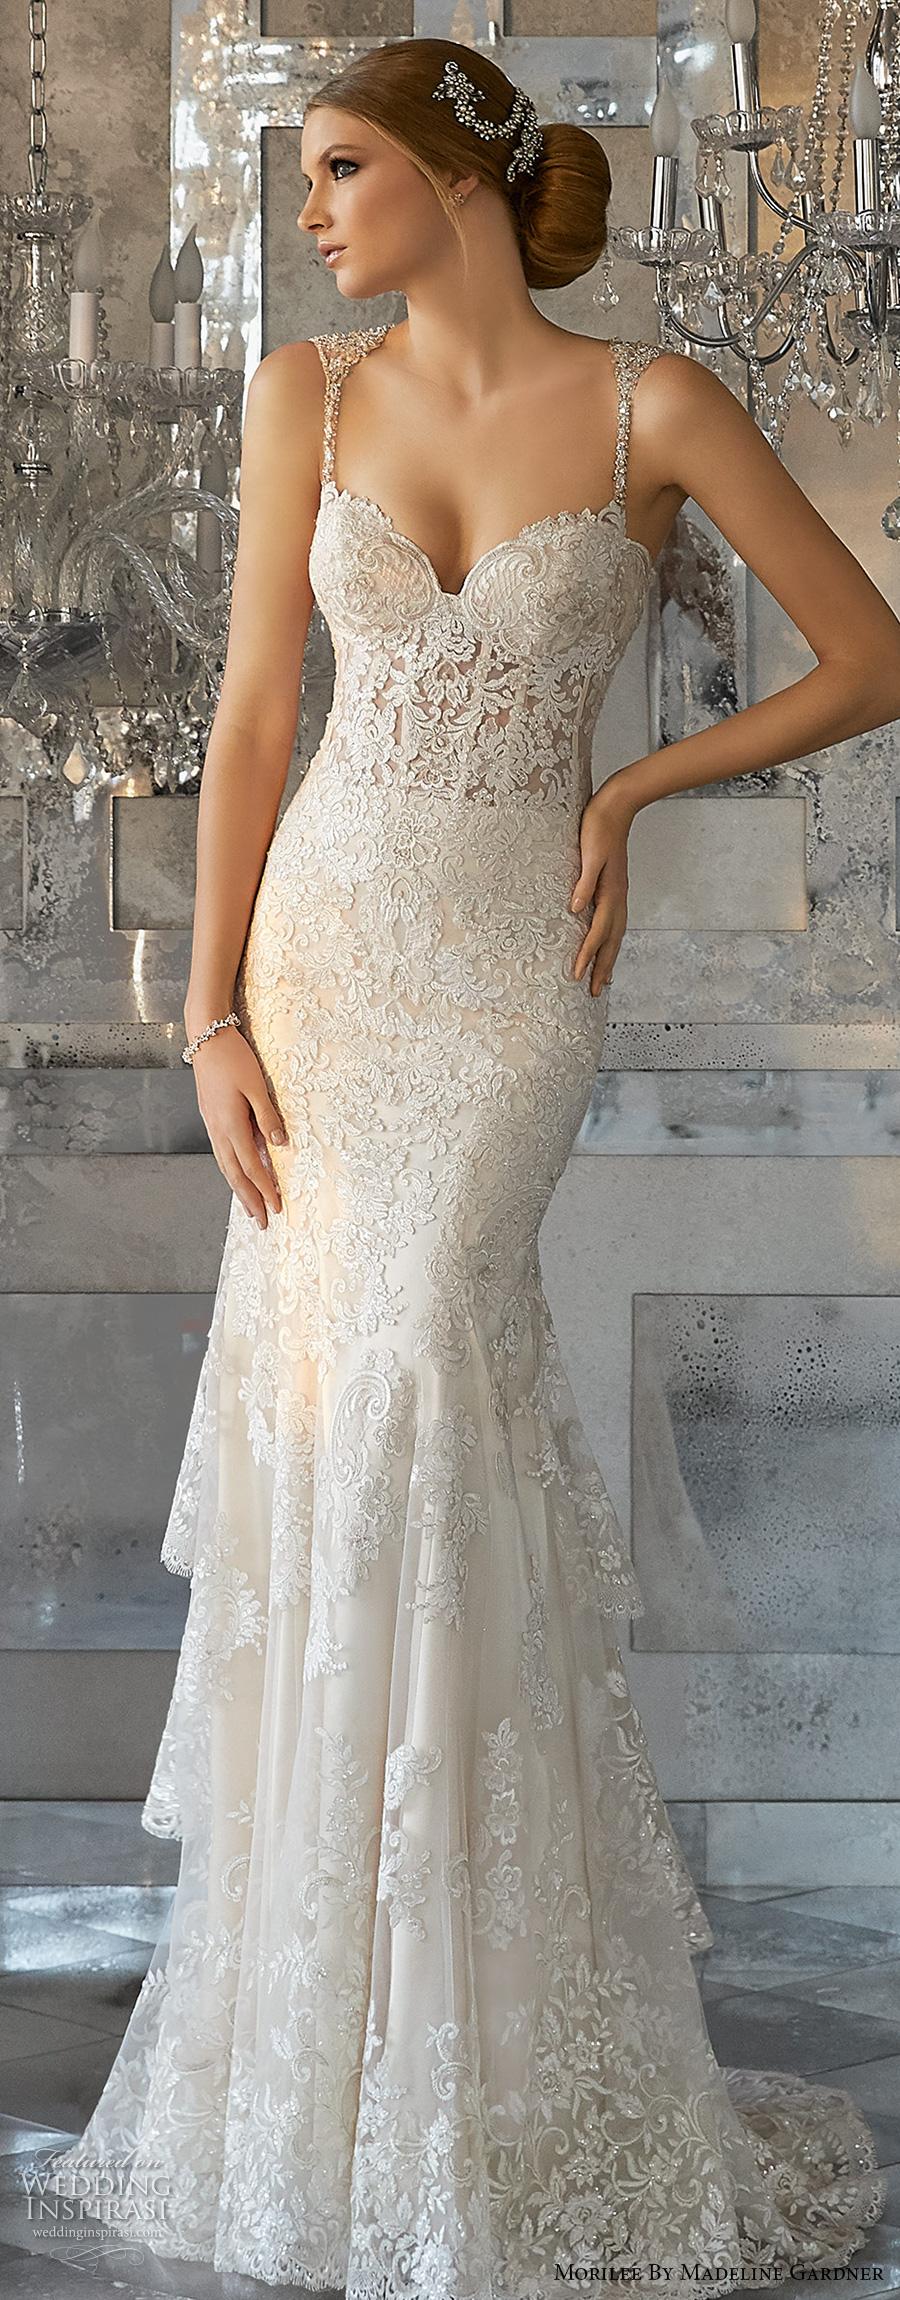 morilee fall 2017 bridal thin strap sweetheart neckline heavily embellished bustier bodice elegant glamorous sheath wedding dress strap back short train (8188) mv